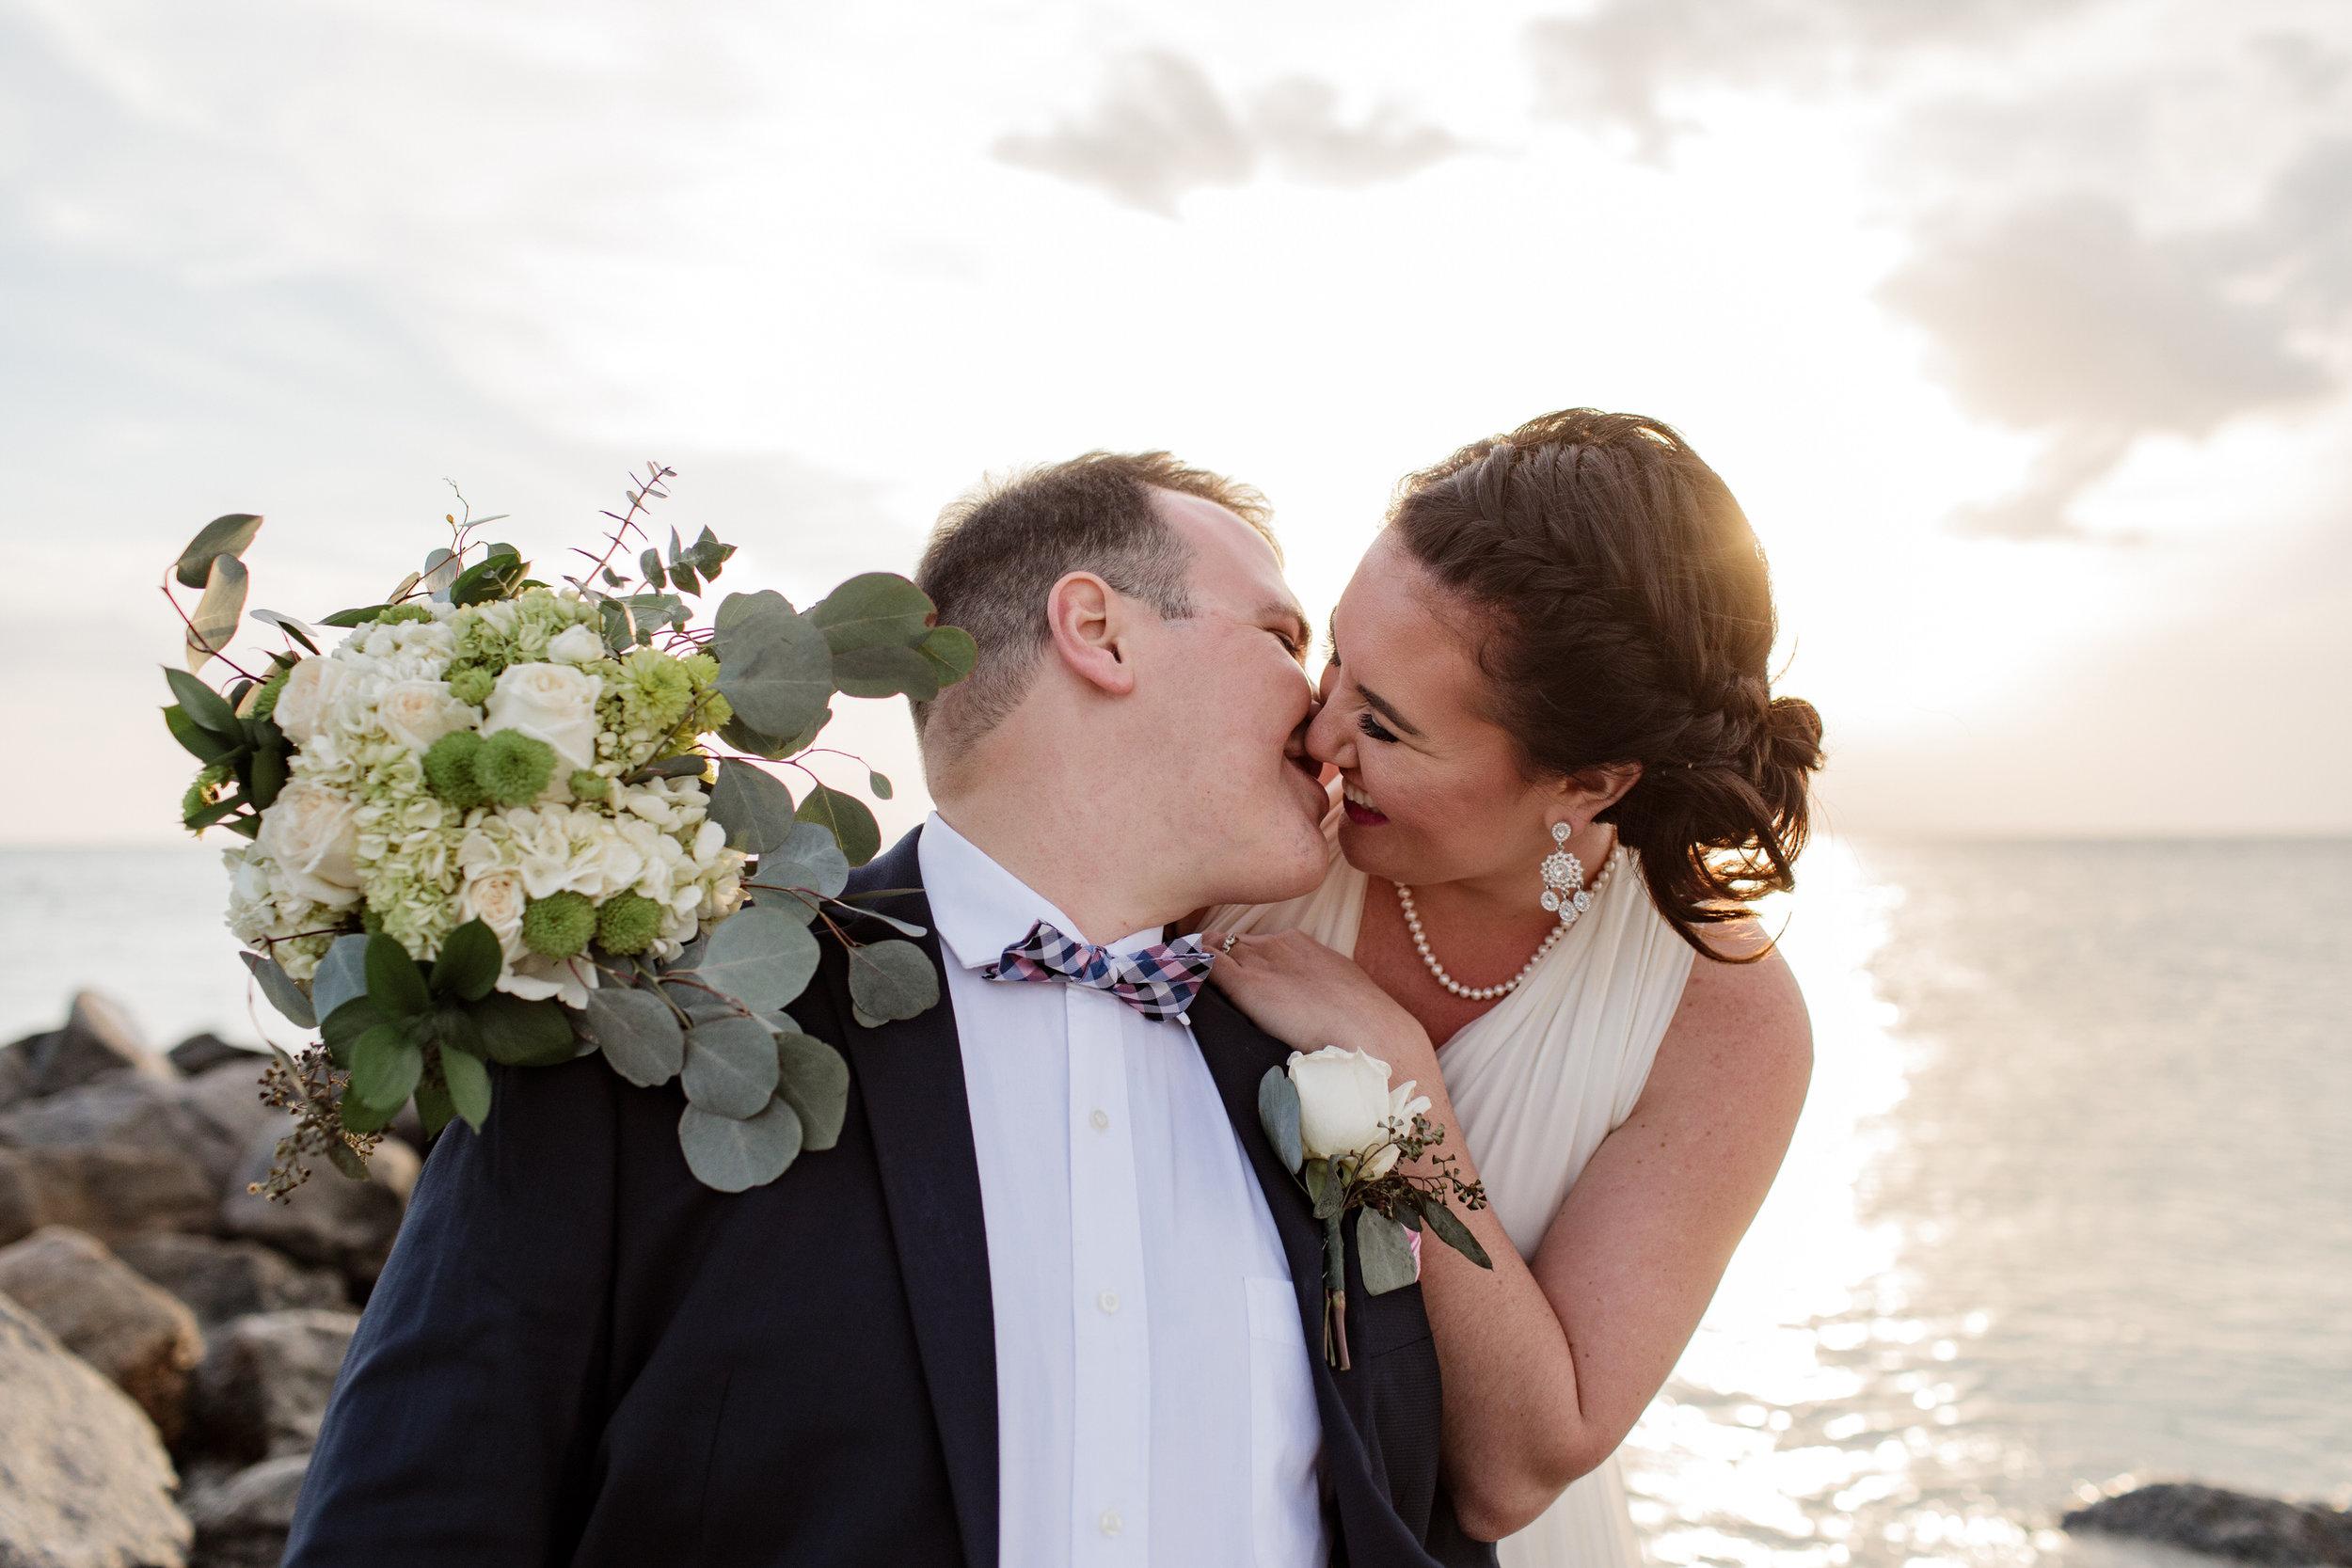 Beltran_Treasure_Island_Elopement_Tampa_Wedding_120-1.jpg